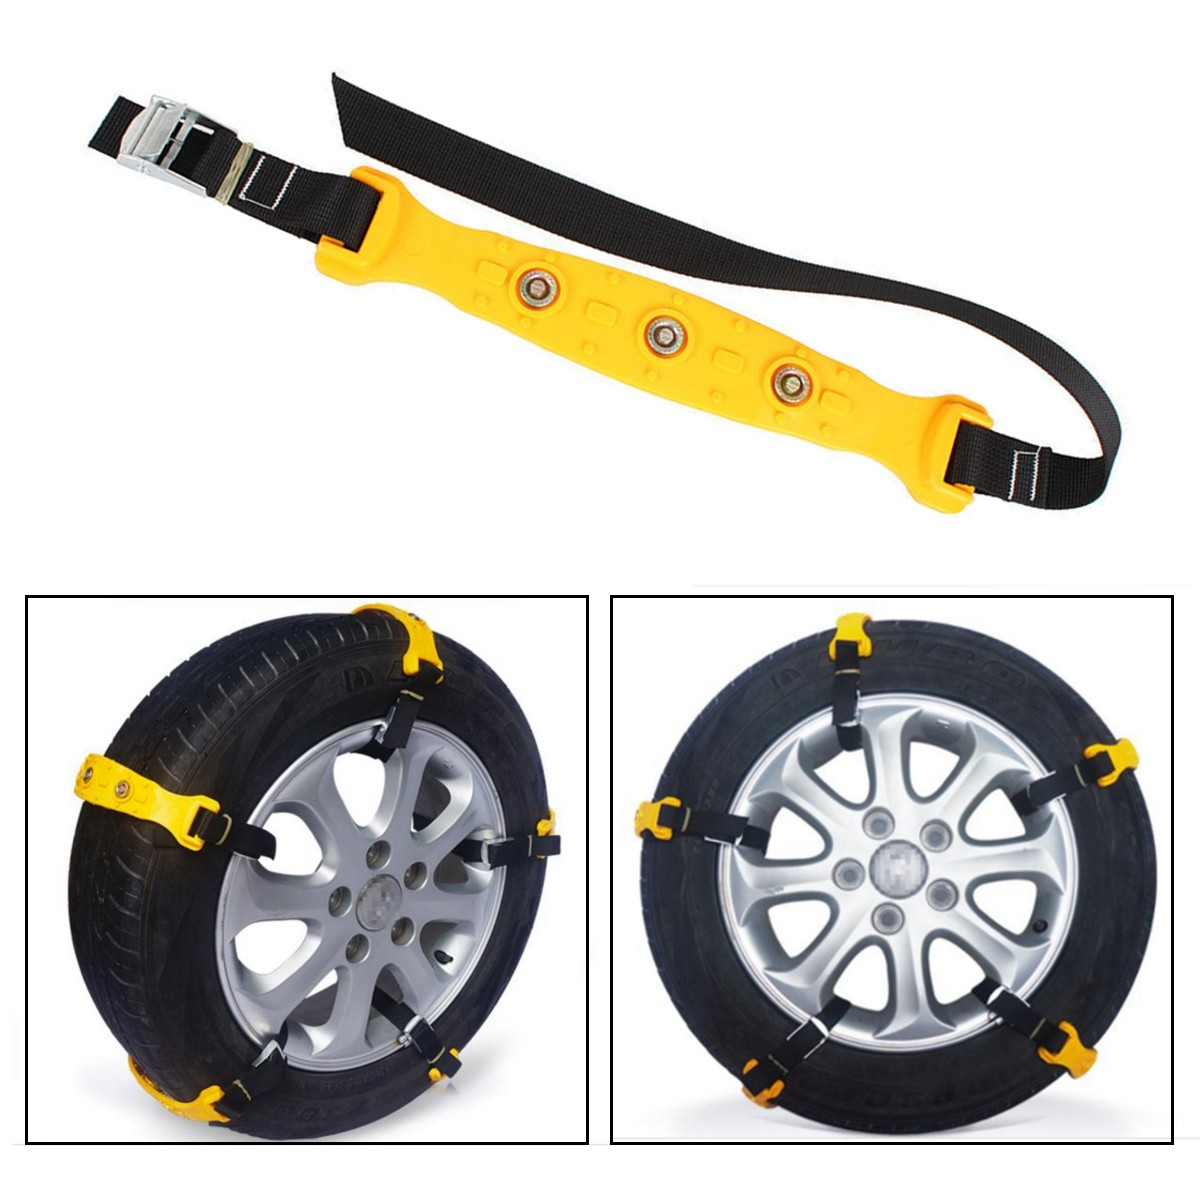 10pcs/set Car Yellow Tire Snow Chains Beef Tendon VAN Wheel Tyre Anti-skid TPU Chains 37 x 4.7cm